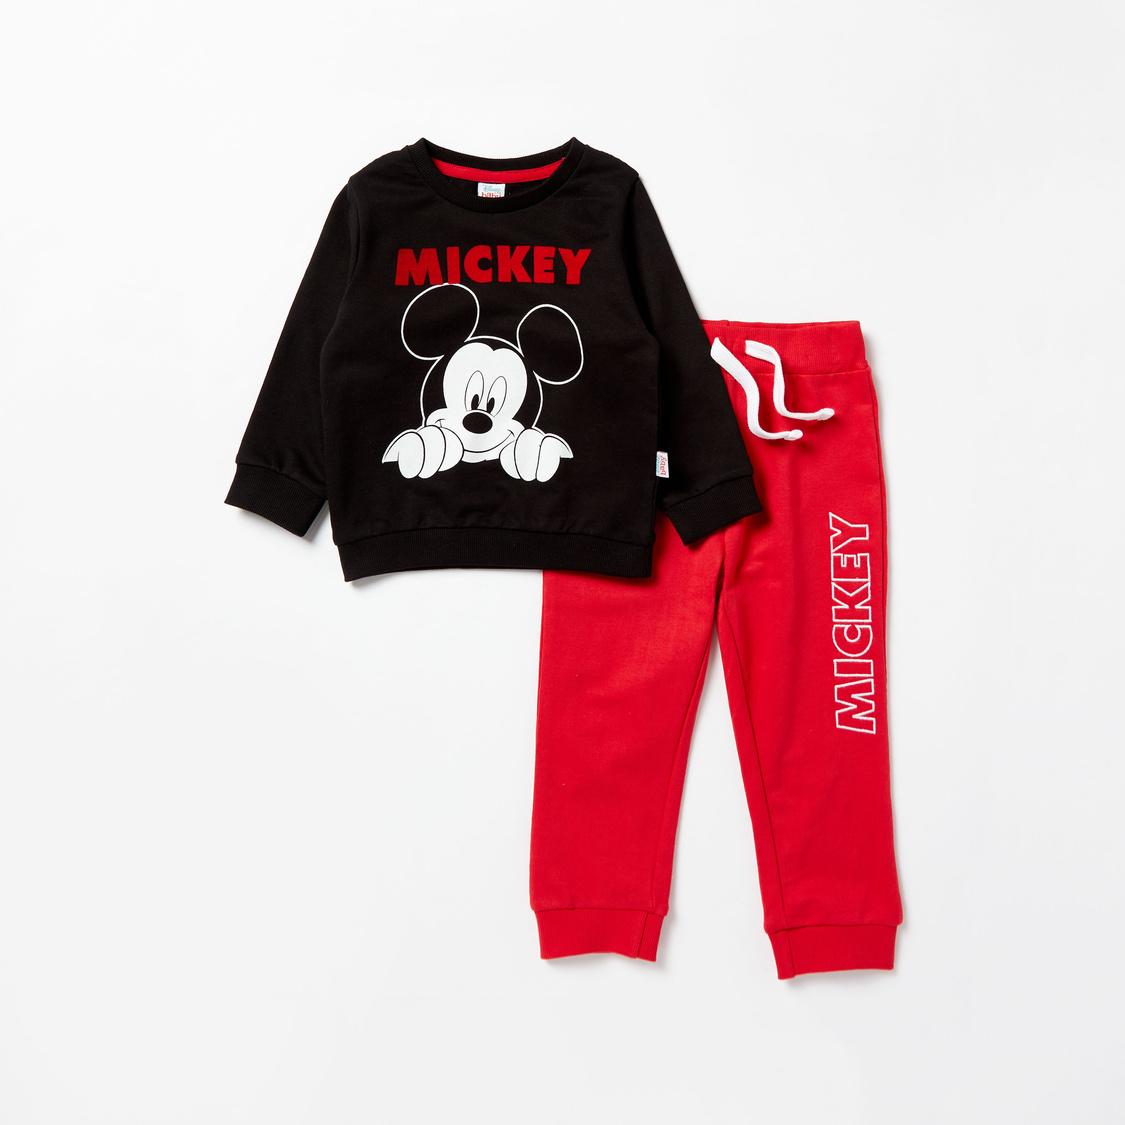 Mickey Mouse Graphic Print Long Sleeves Sweatshirt and Jog Pants Set